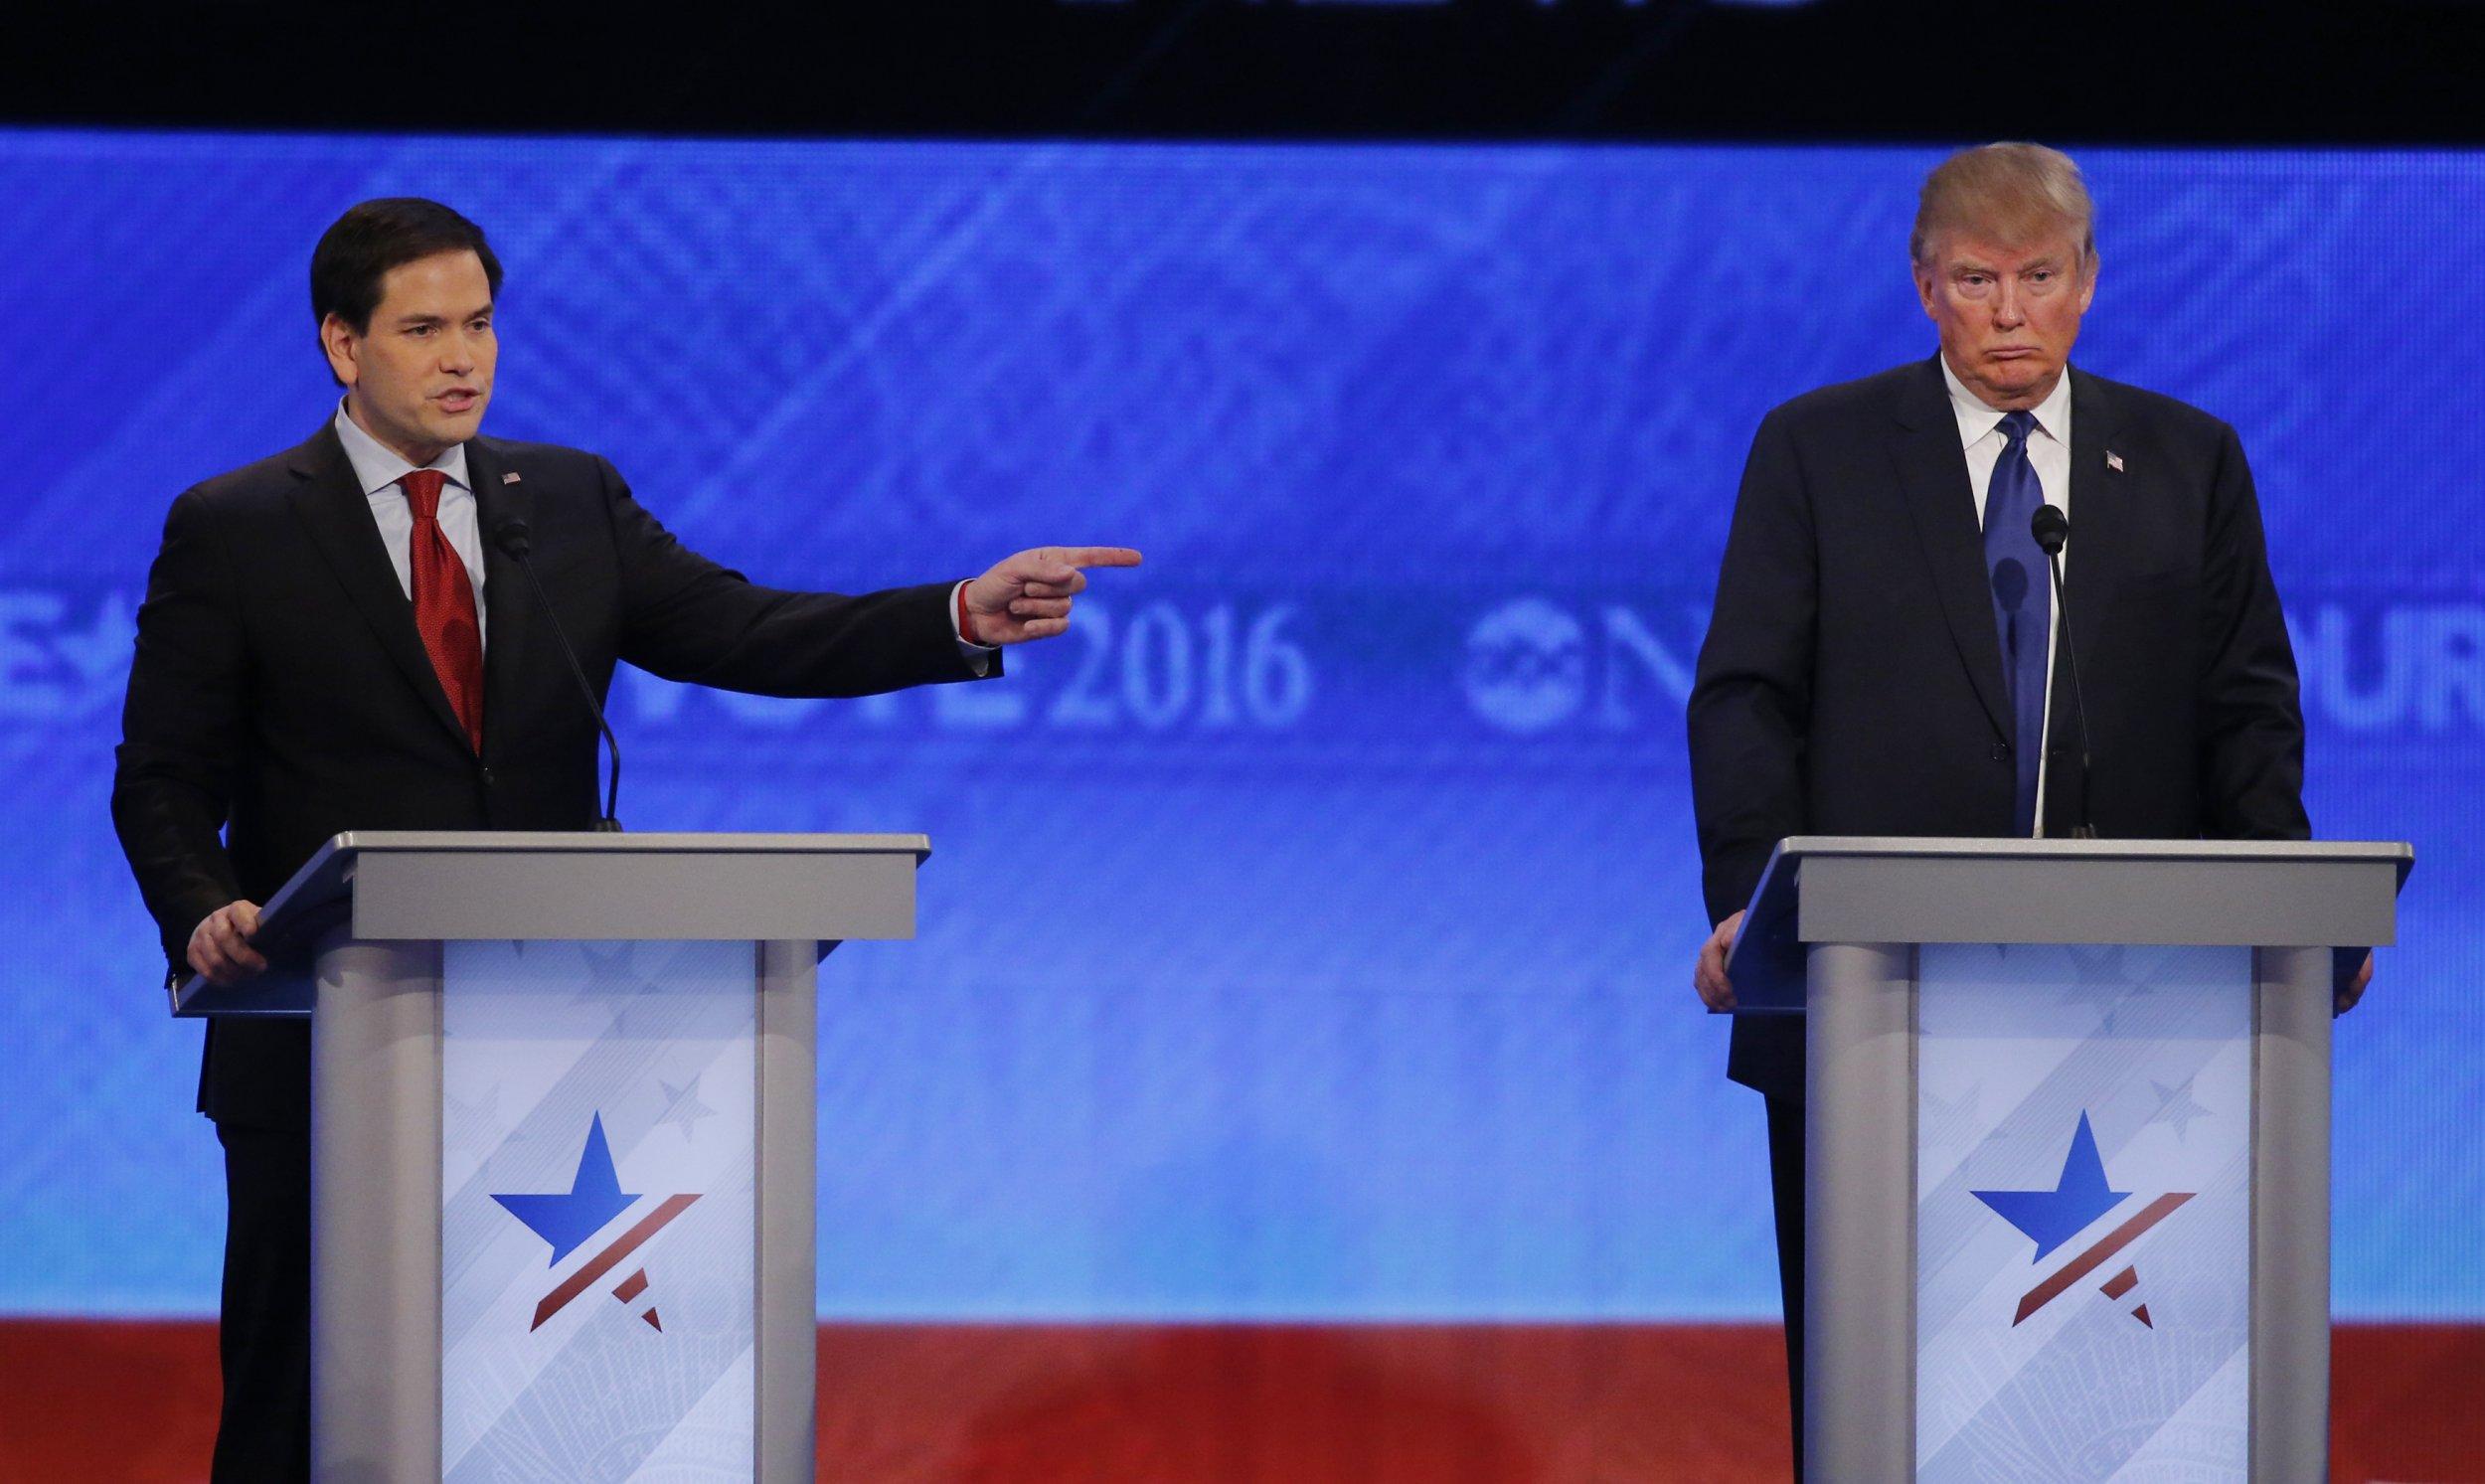 0207_gop_debate_rubio_trump